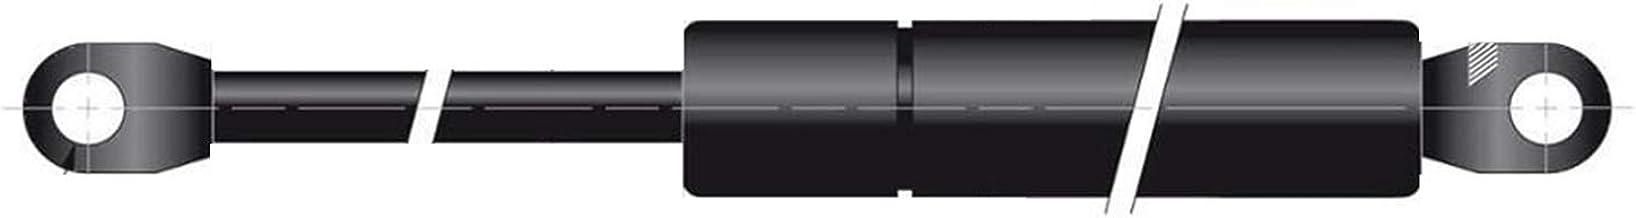 SSB-JIAJUPJ, 1 stuk 150 N dikte 105 mm hole pitch 30 mm racesport auto gas lente veer been been been gasdruk lente gasvere...